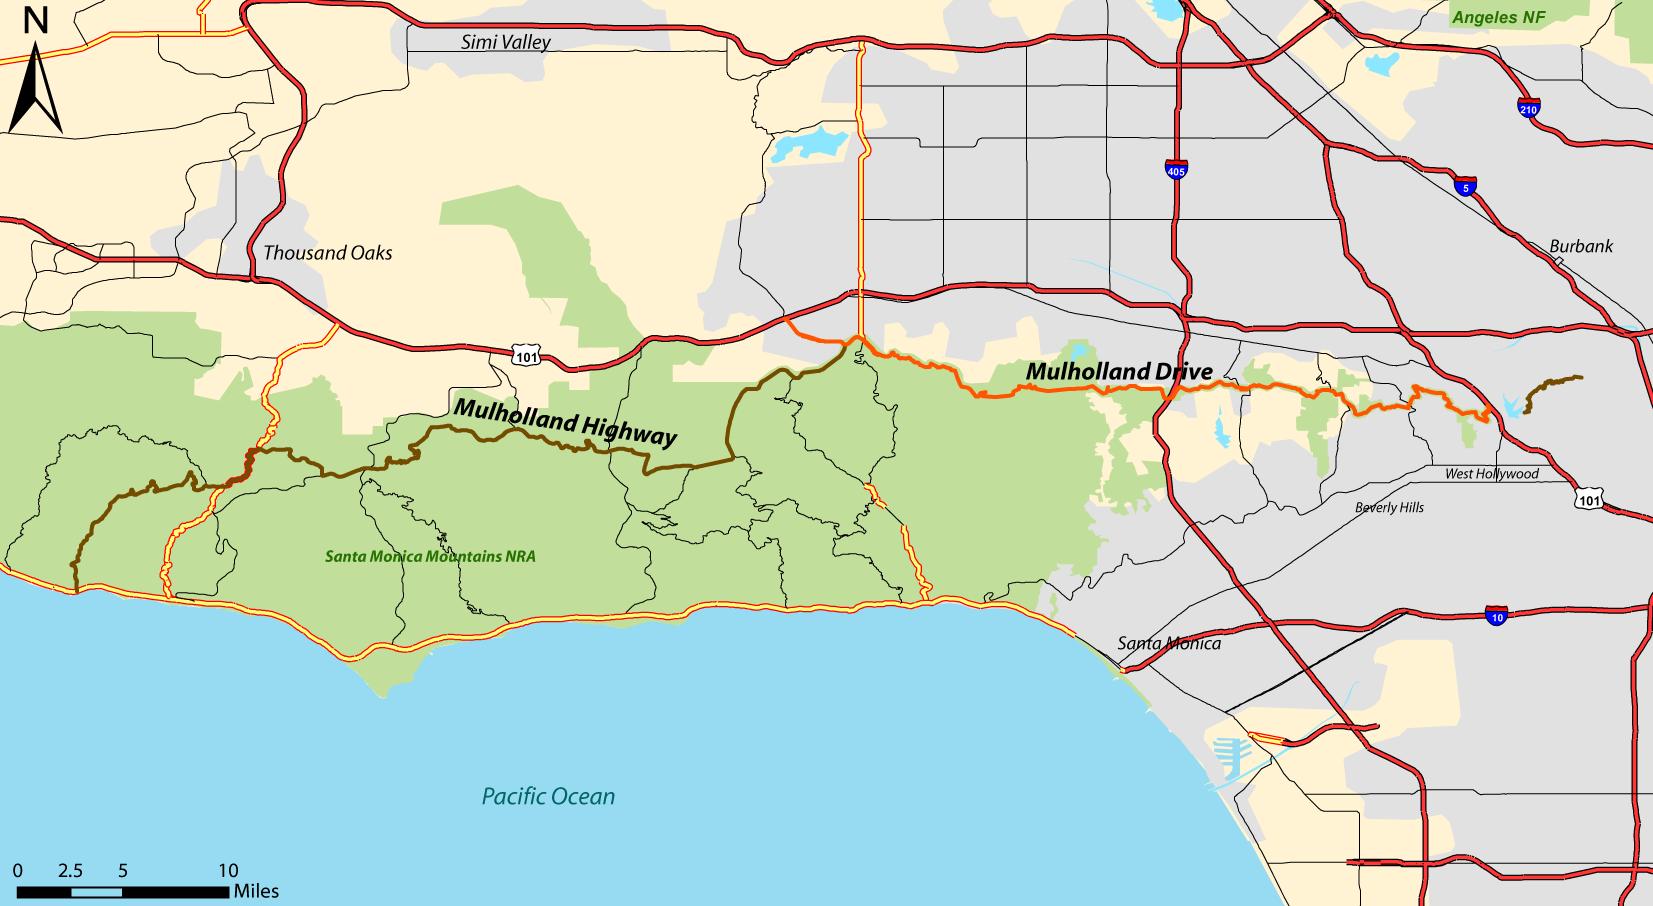 Mulholland Drive (in orange) - click to enlarge. Greg Kidd